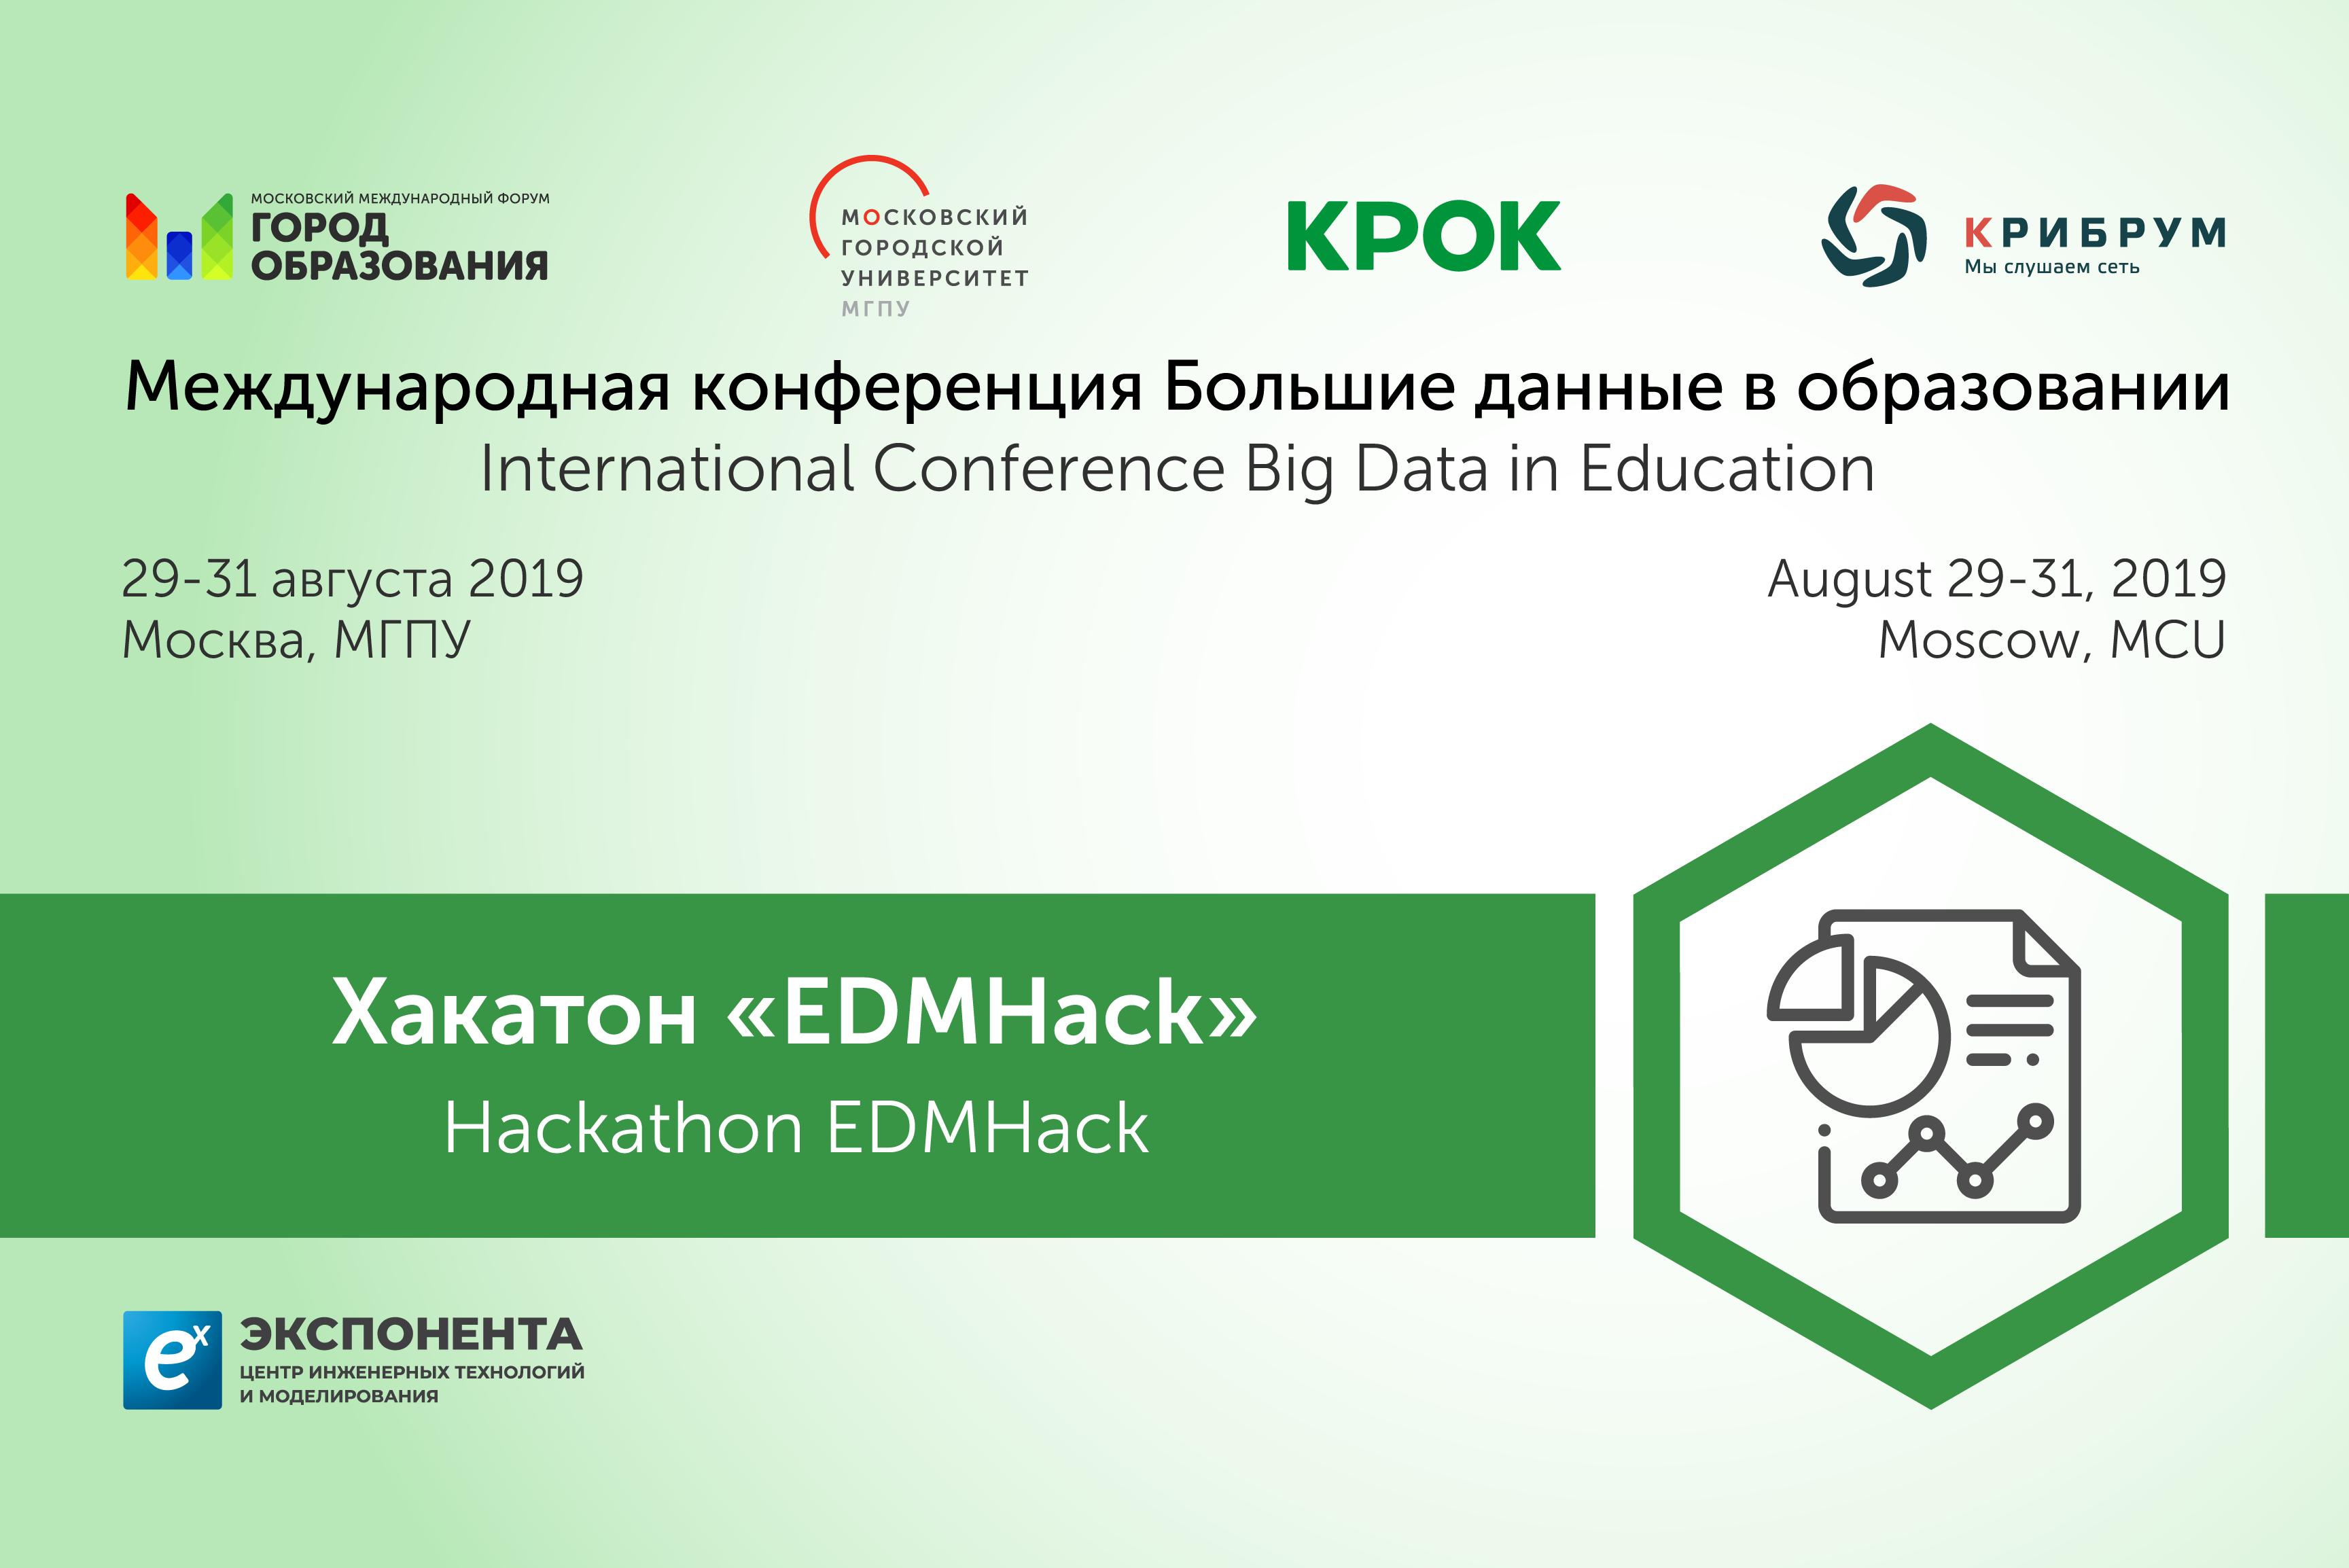 Hackathon EDMHack